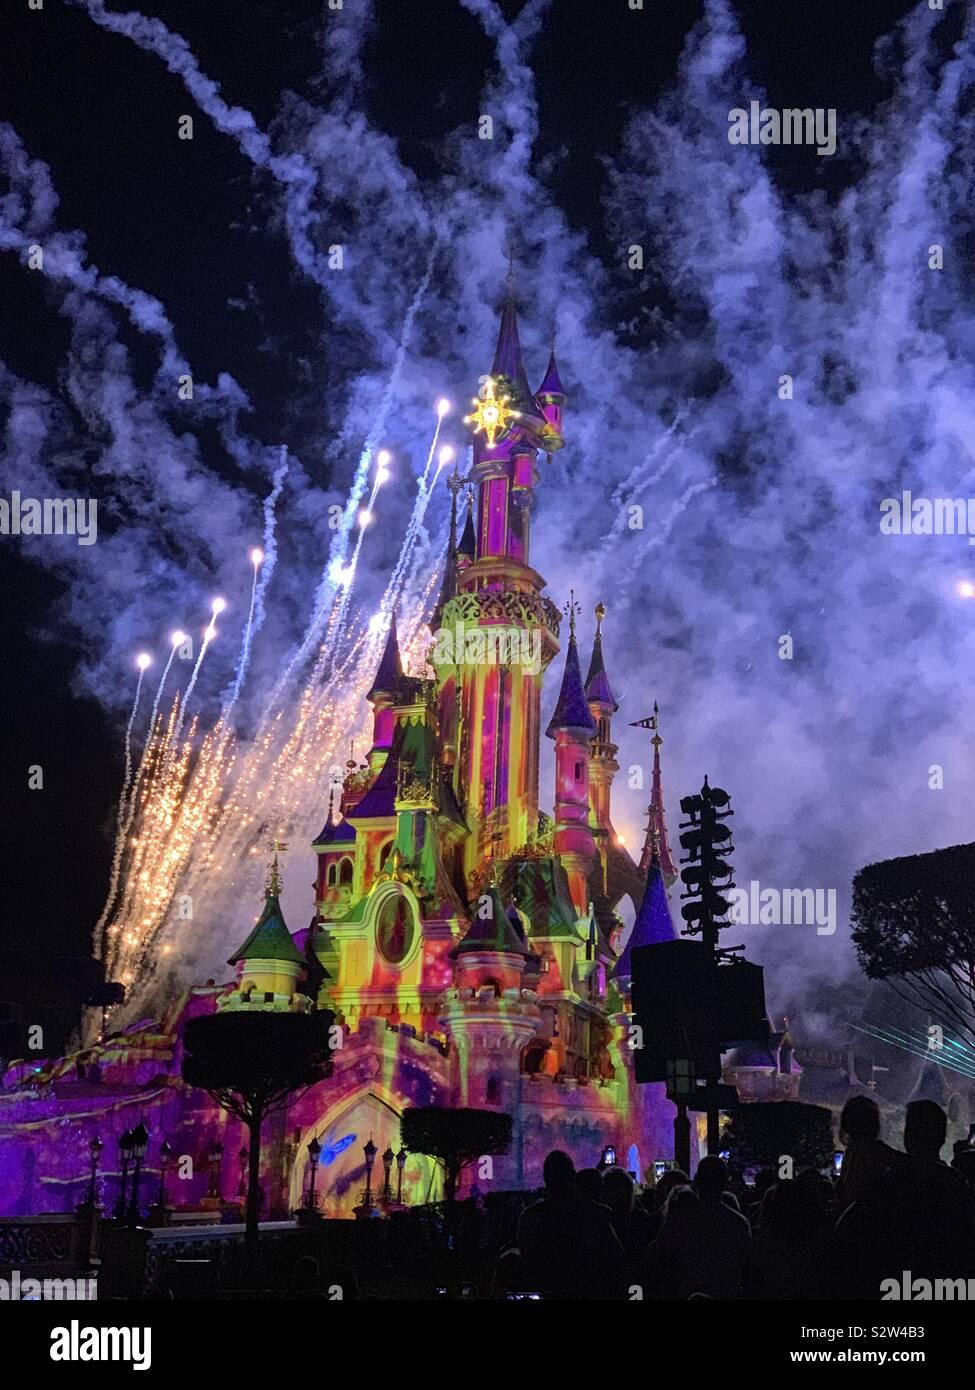 Disneyland Paris illuminations Stock Photo